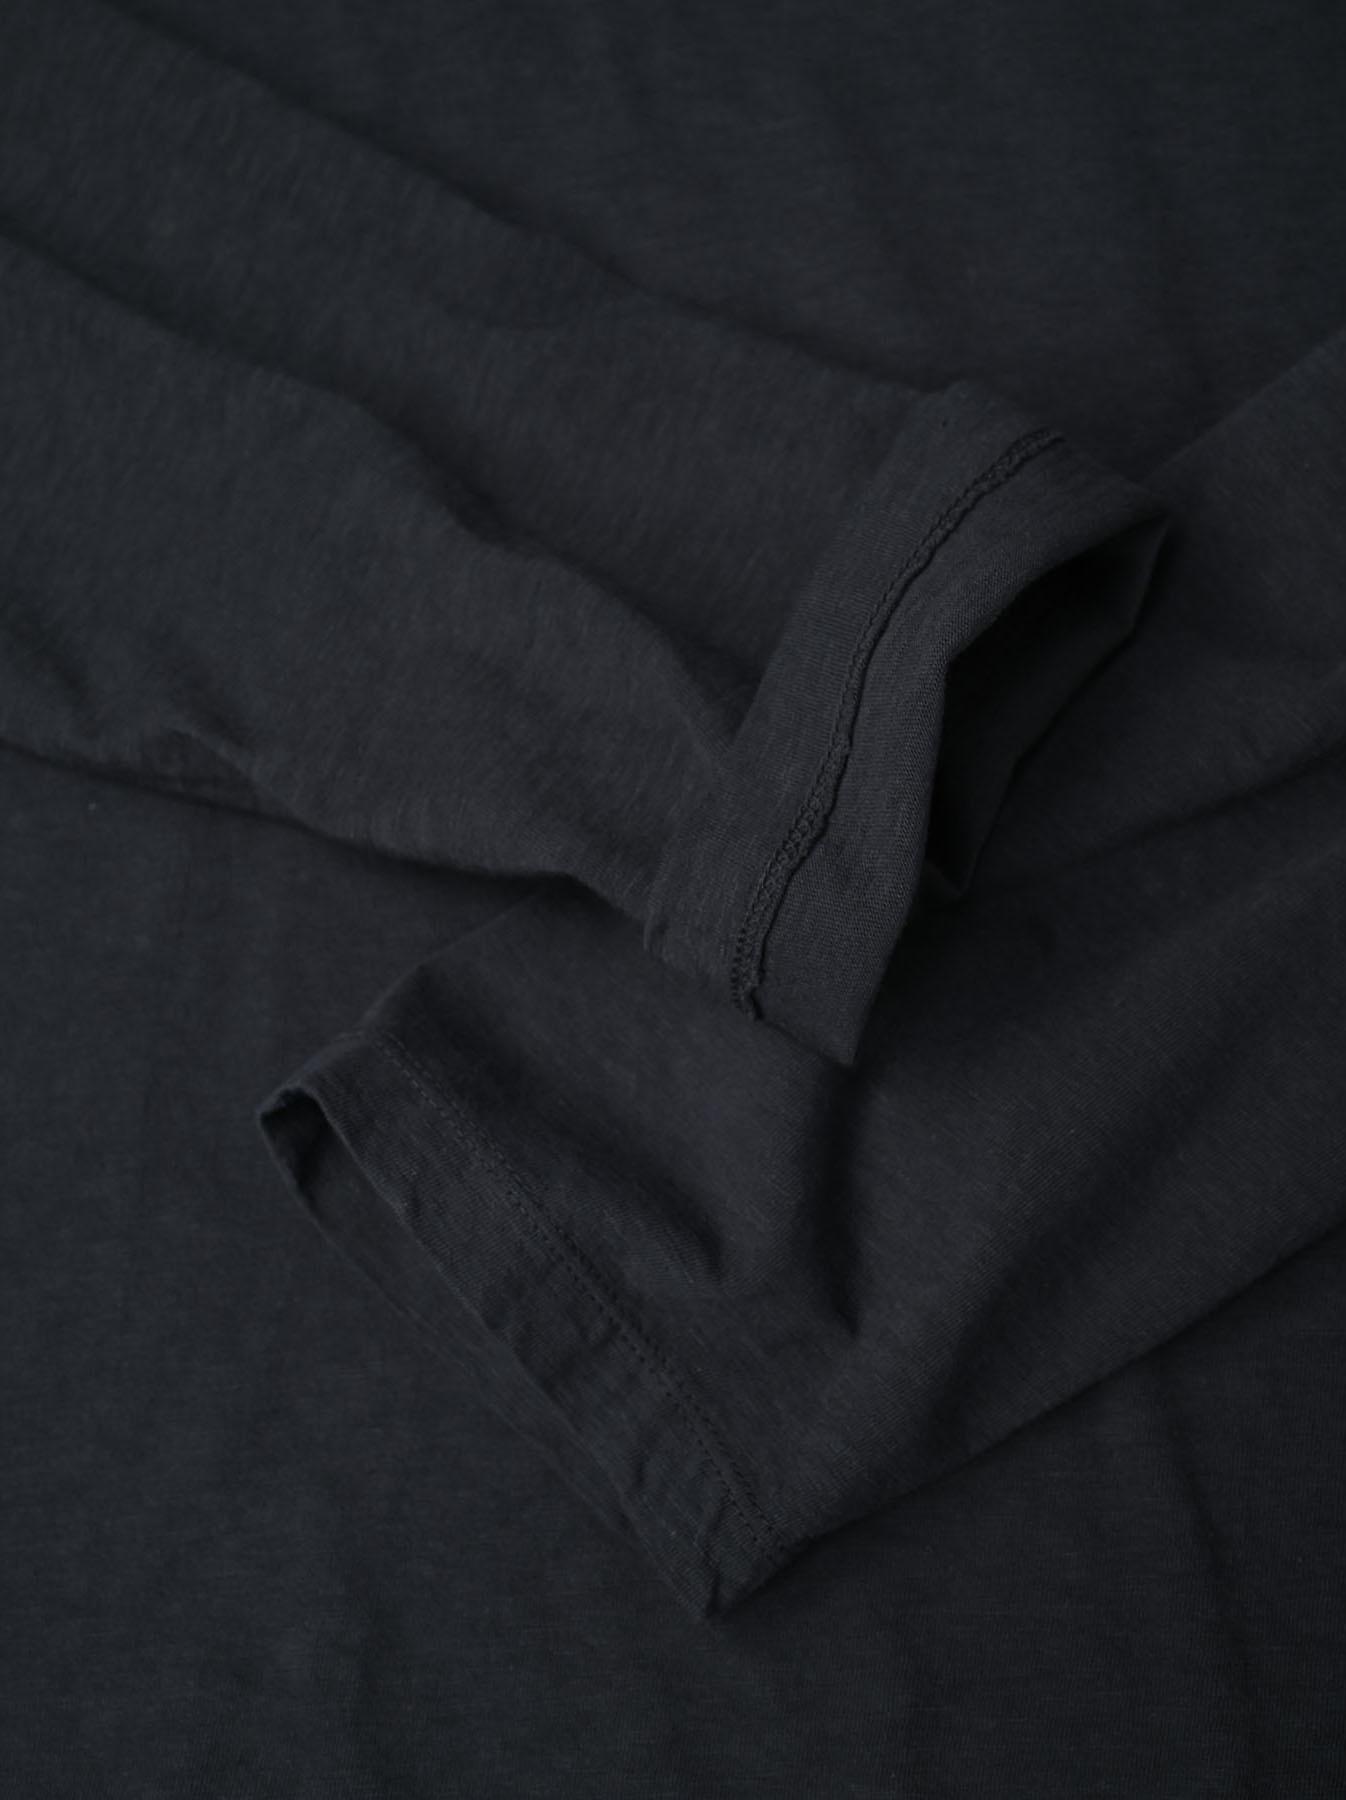 Zimbabwe Cotton Ocean Long-sleeved T-shirt-8